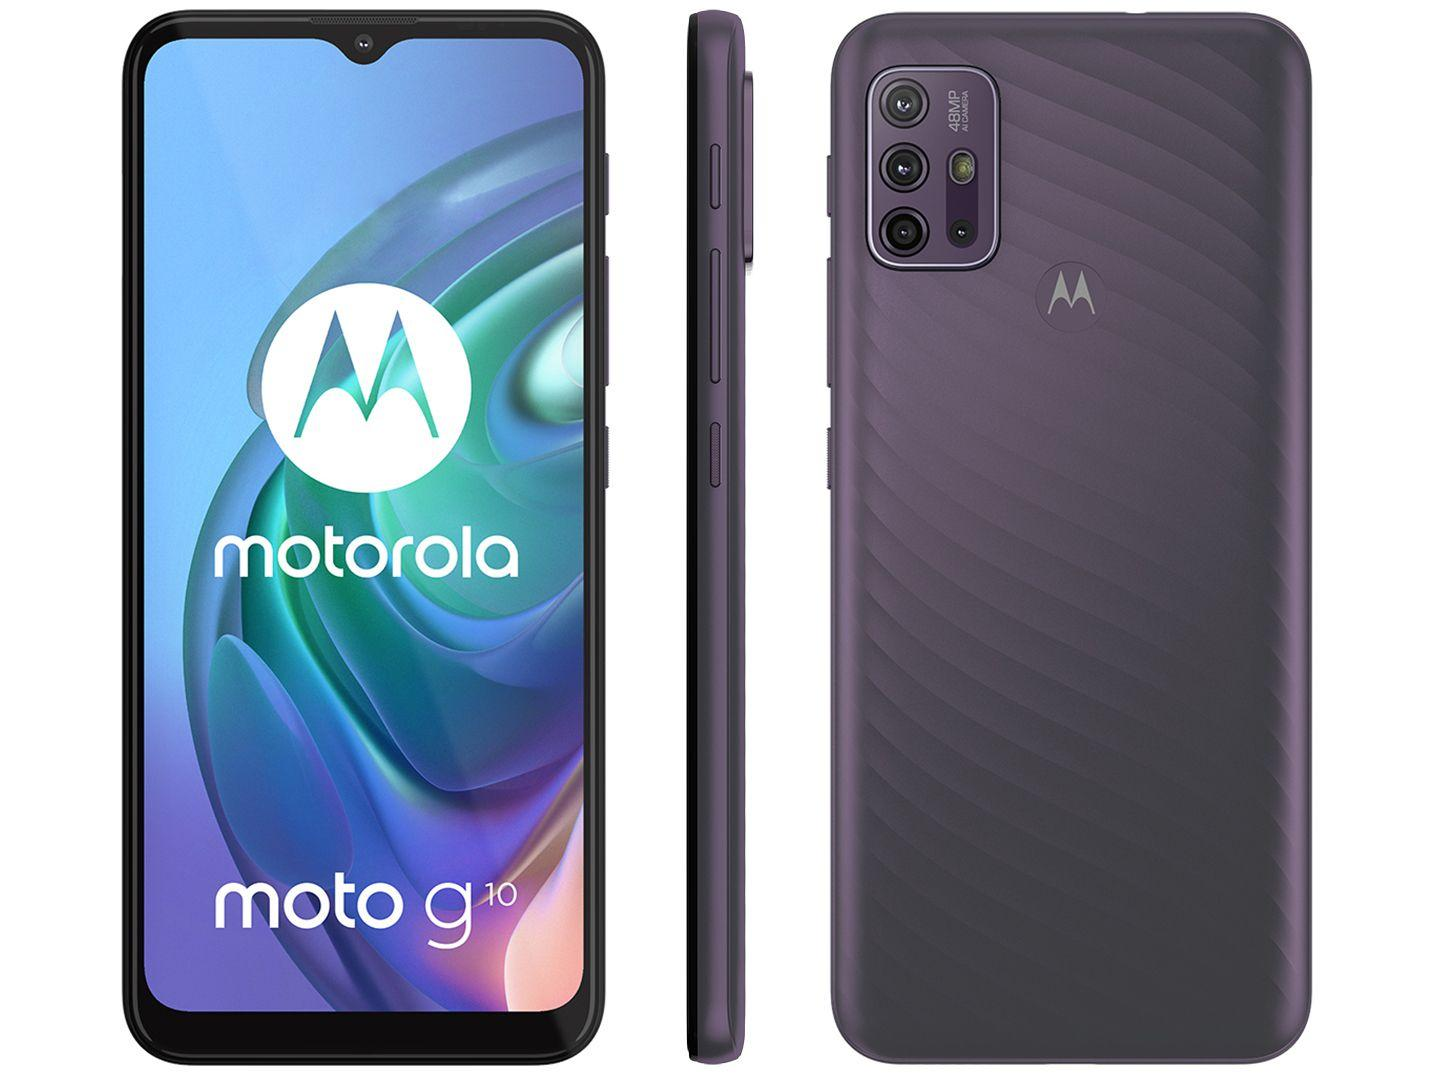 Smartphone Moto G10 - Motorola - Cinza Aurora